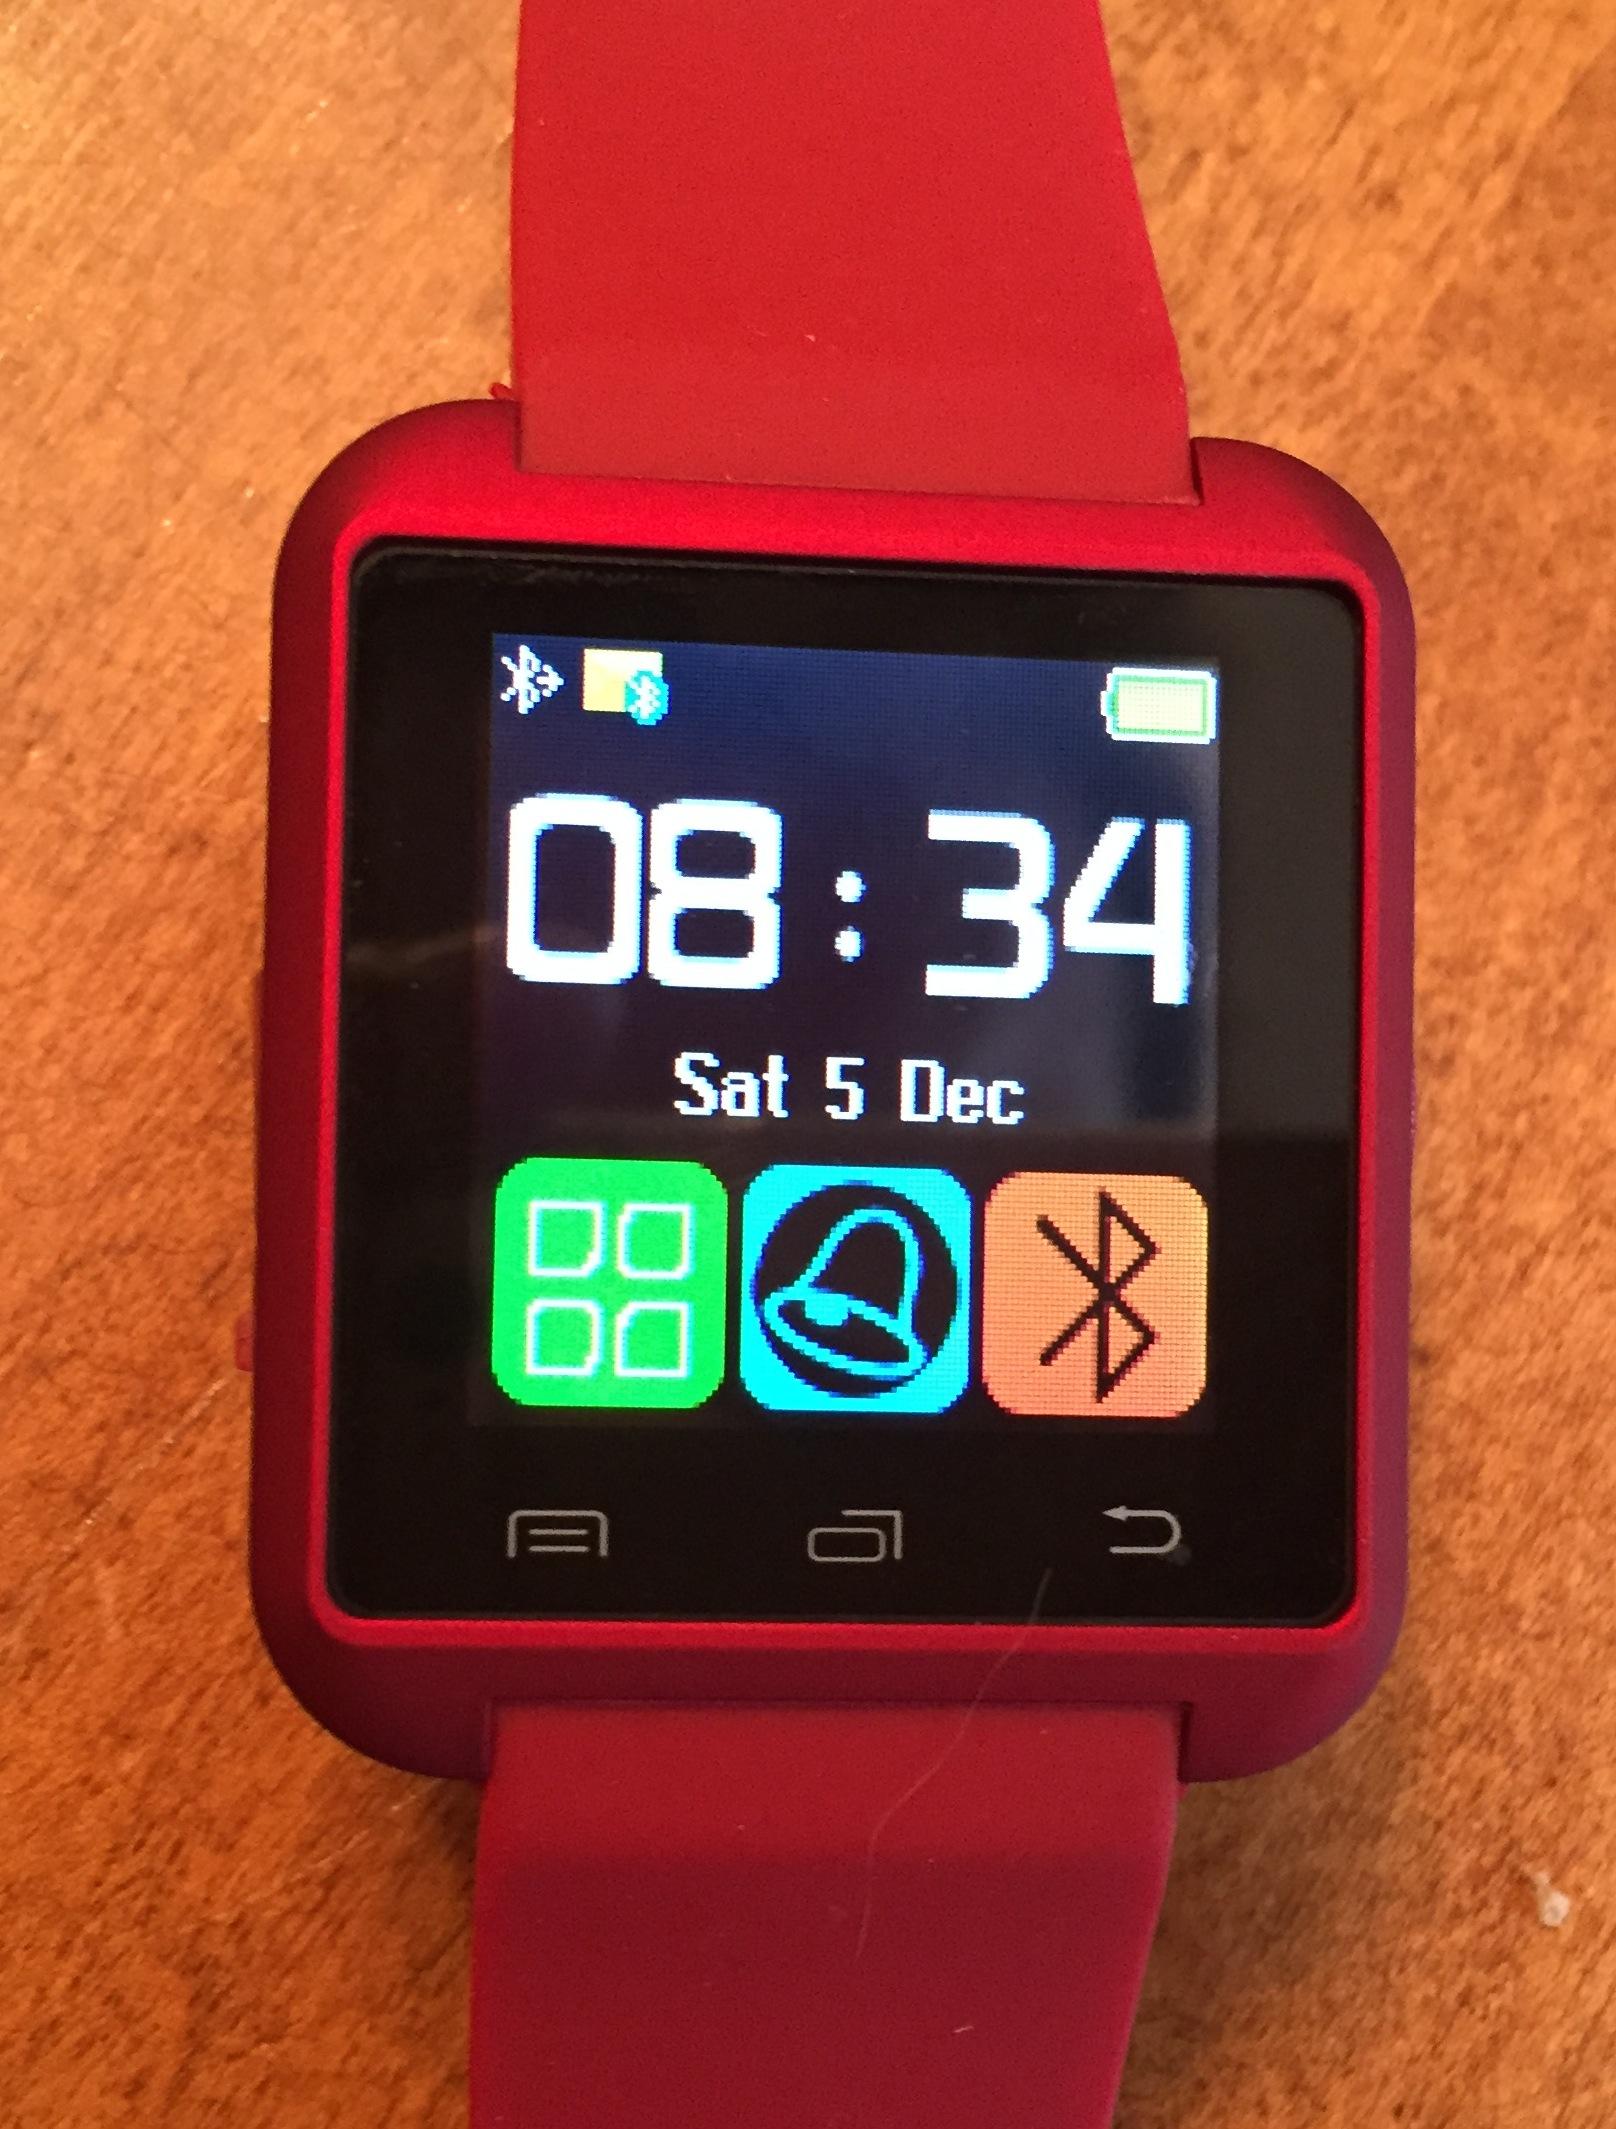 U8 Smartwatch, cheap iOS Android Apple watch Alternative Knock Off Bootleg Clone